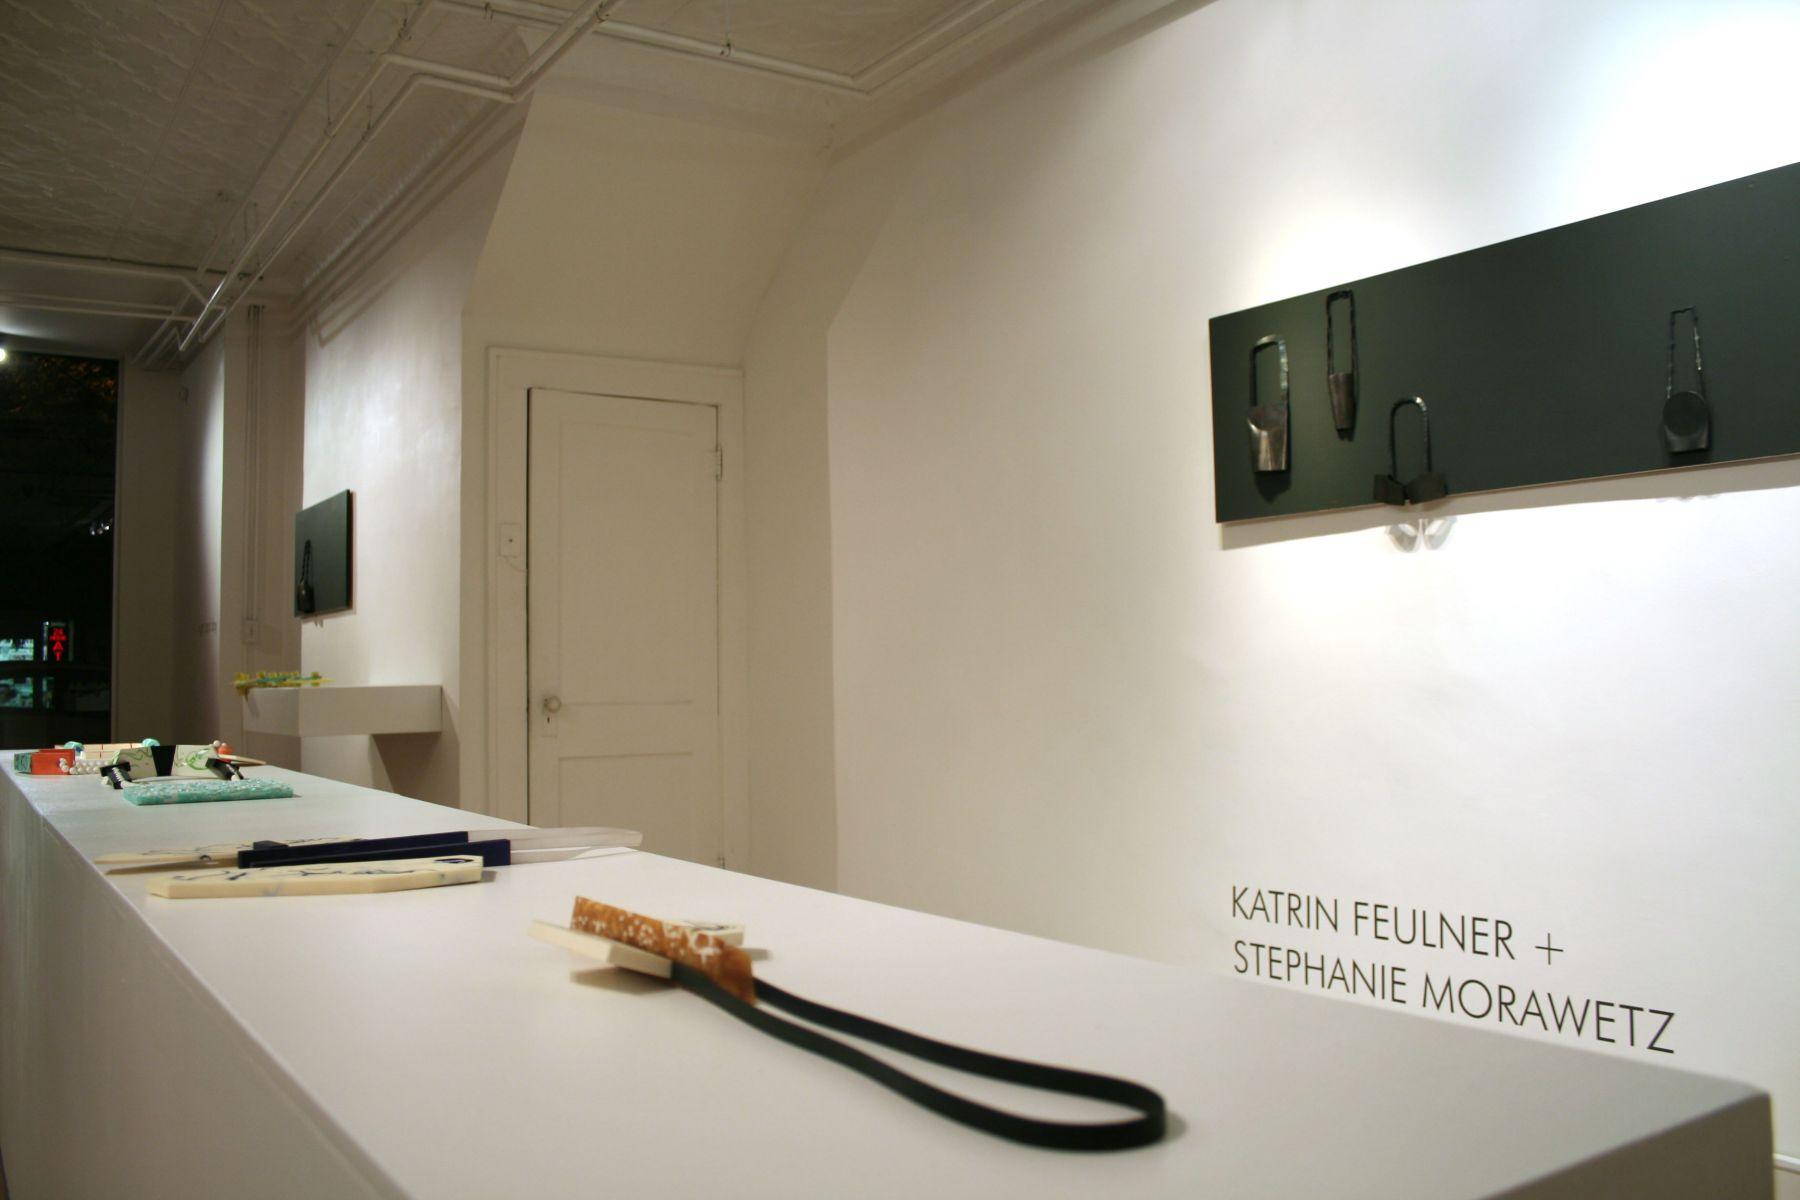 Katrin Feulner, Stephanie Morawetz